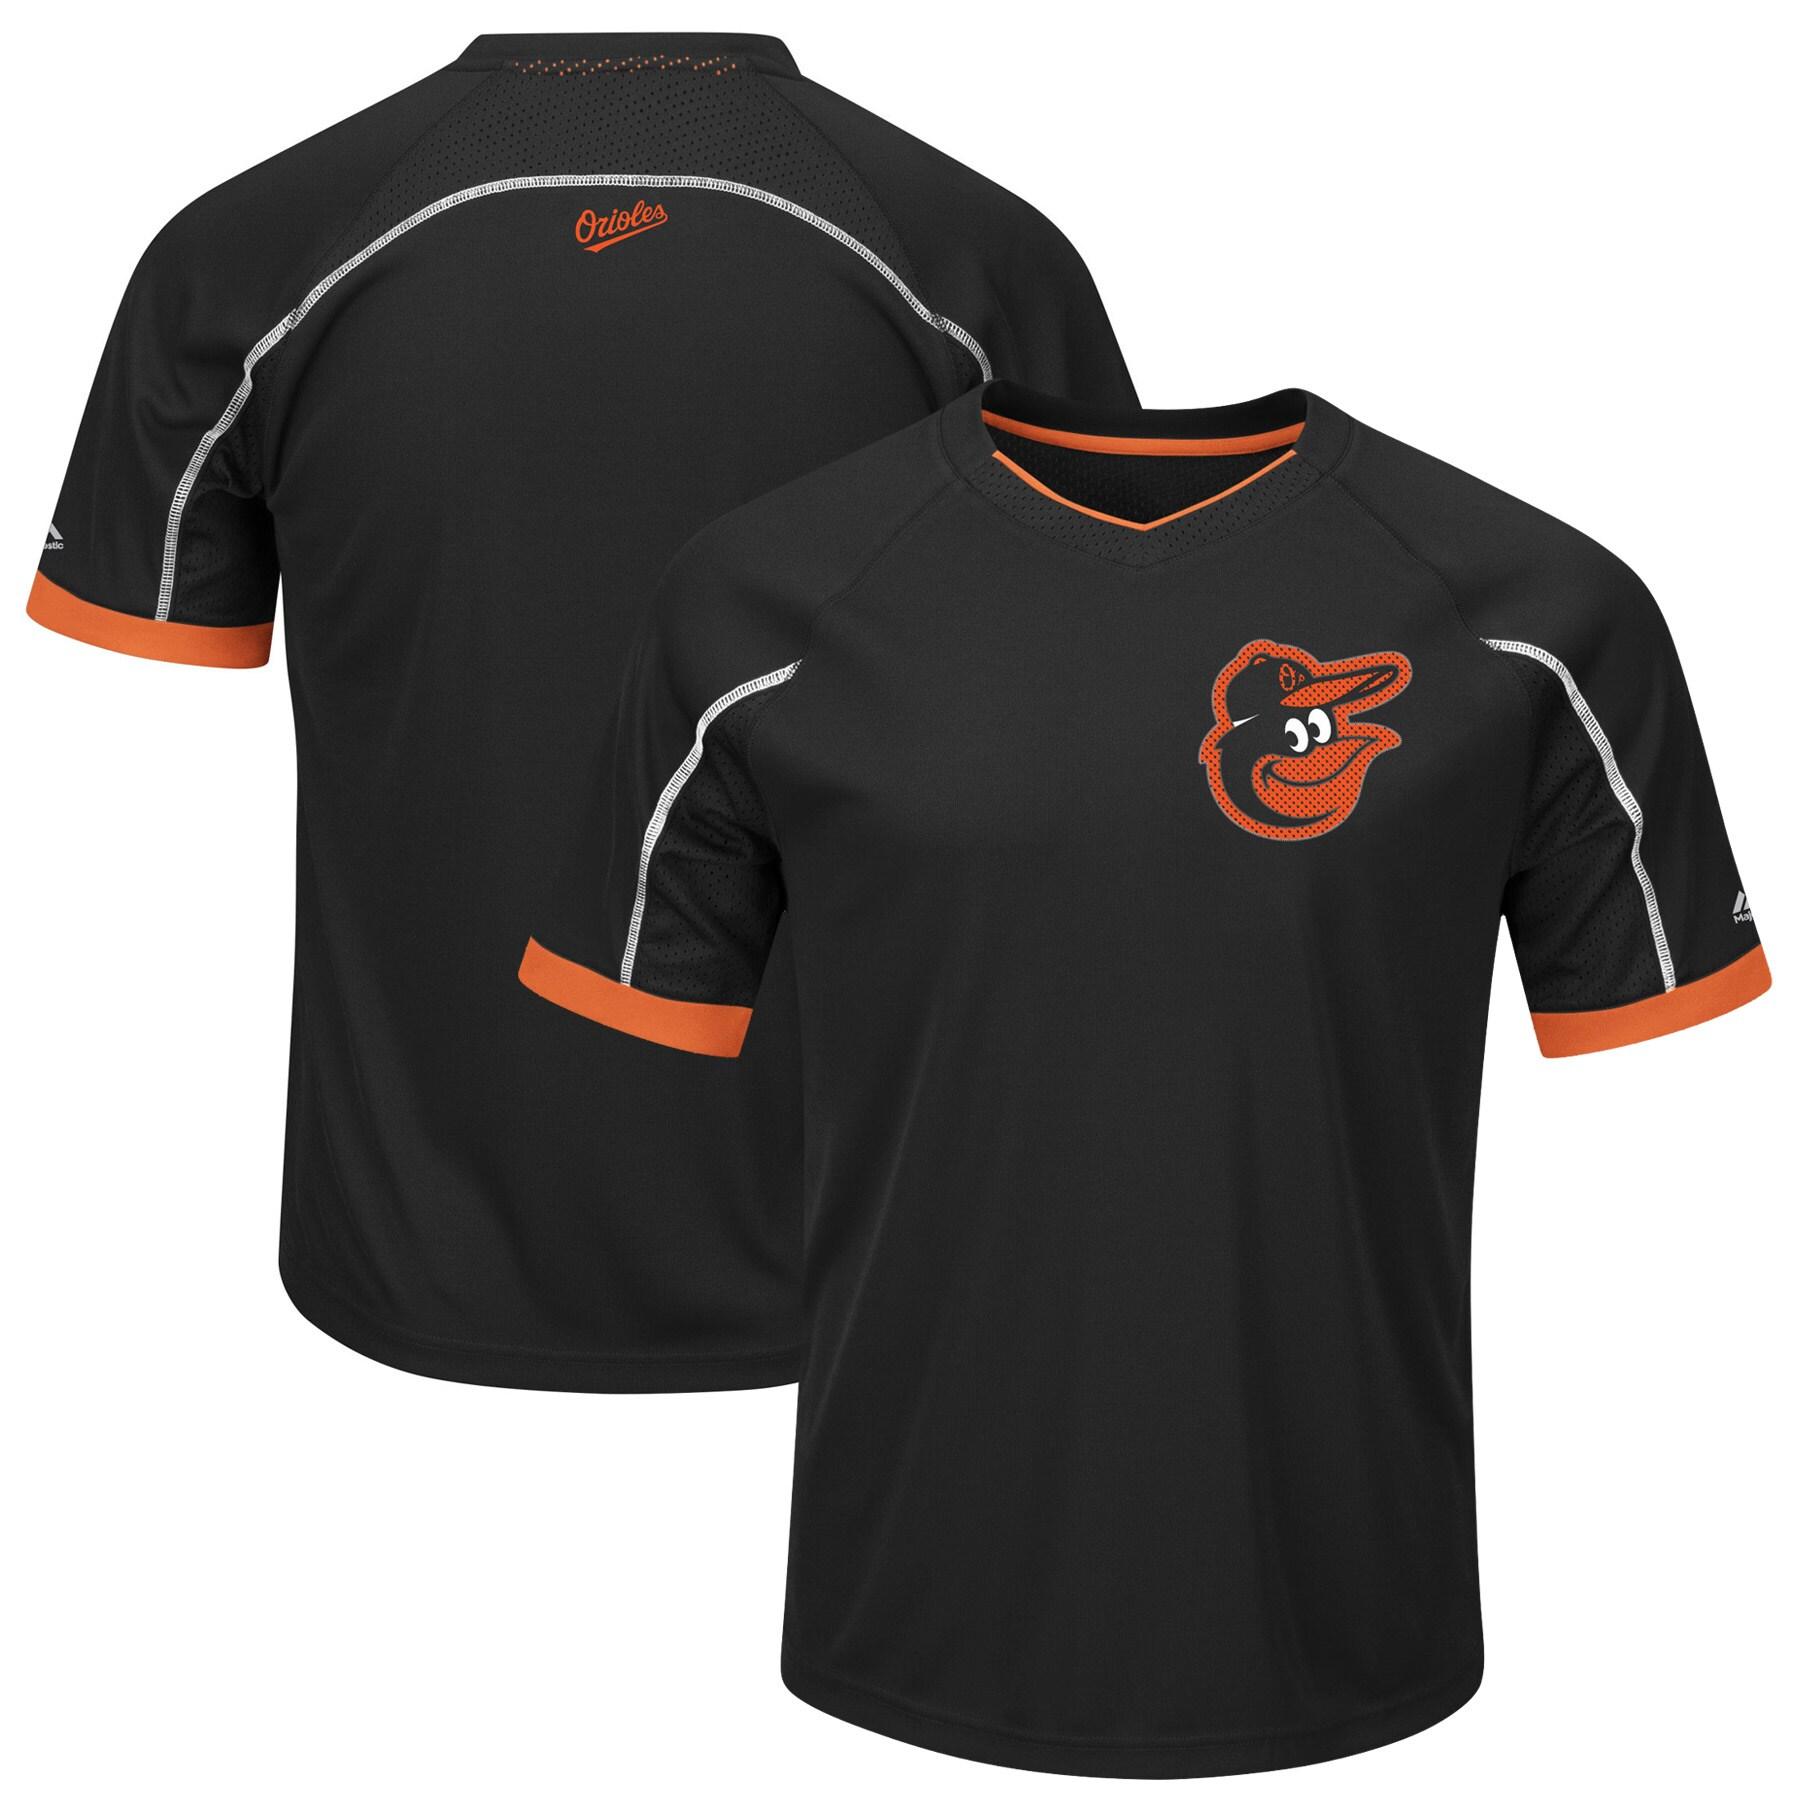 Baltimore Orioles Majestic Big & Tall Emergence V-Neck T-Shirt - Black/Orange